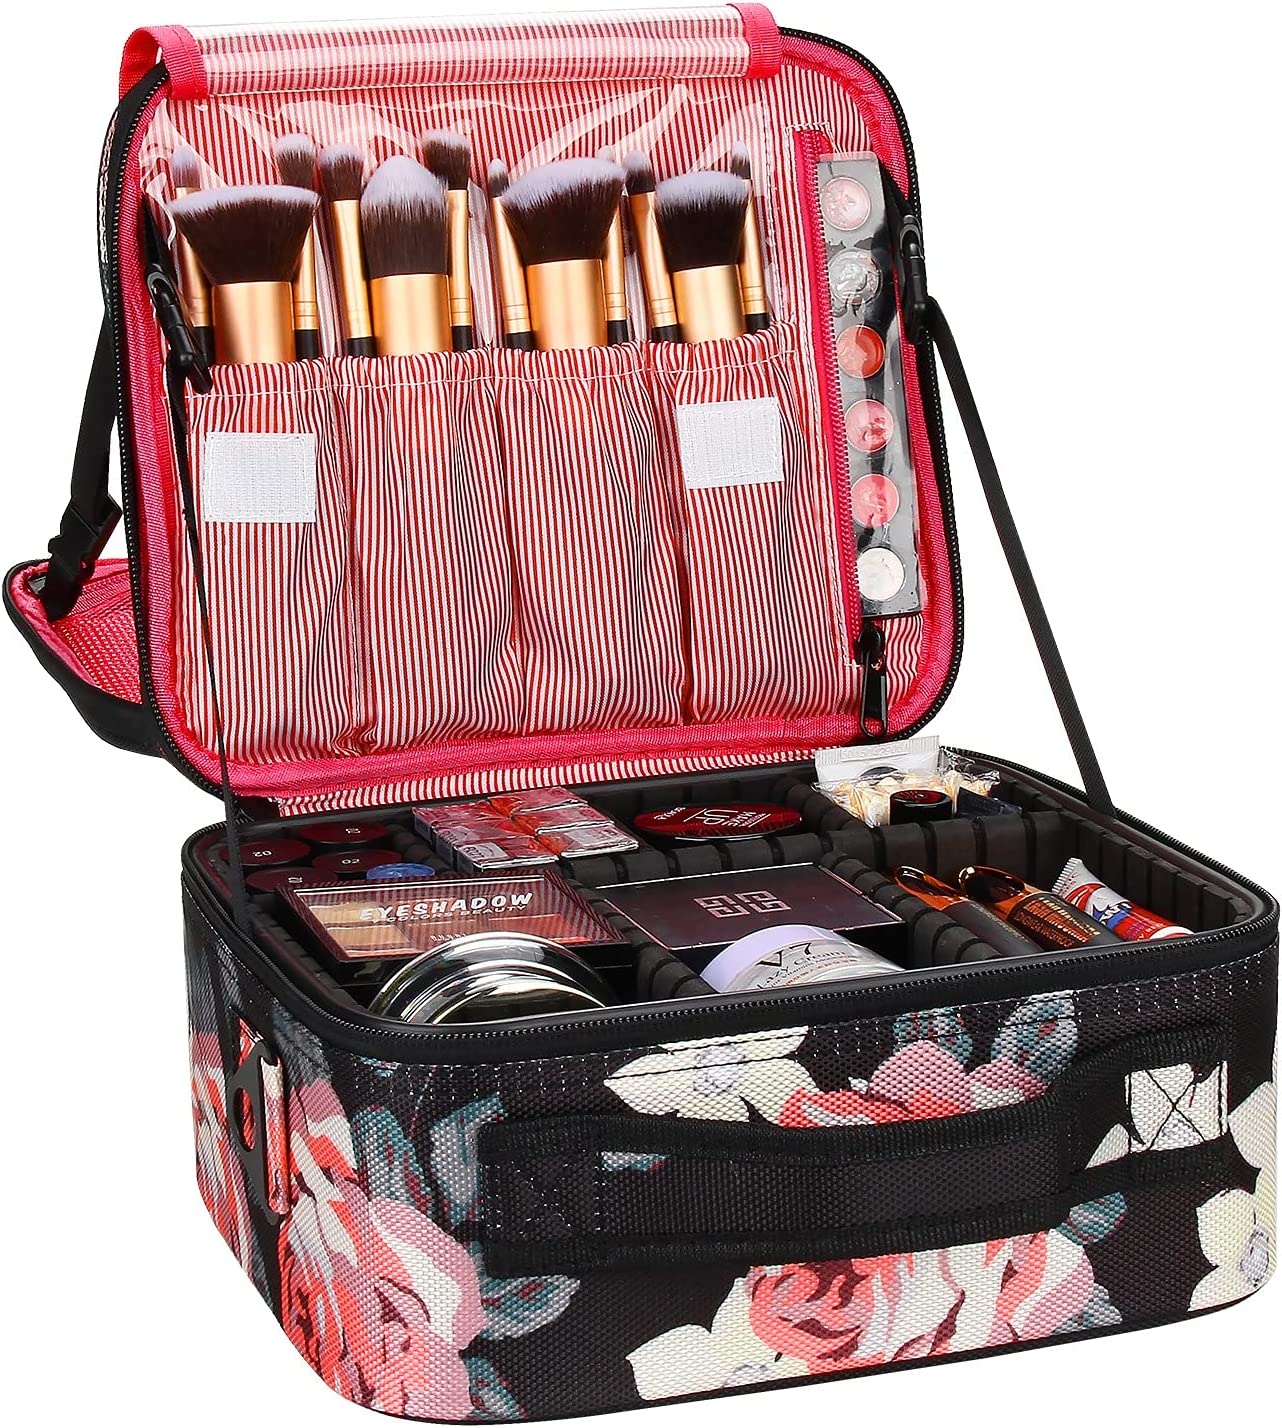 NEW Travel Makeup Case Chomeiu- Org Bag Cosmetic Professional